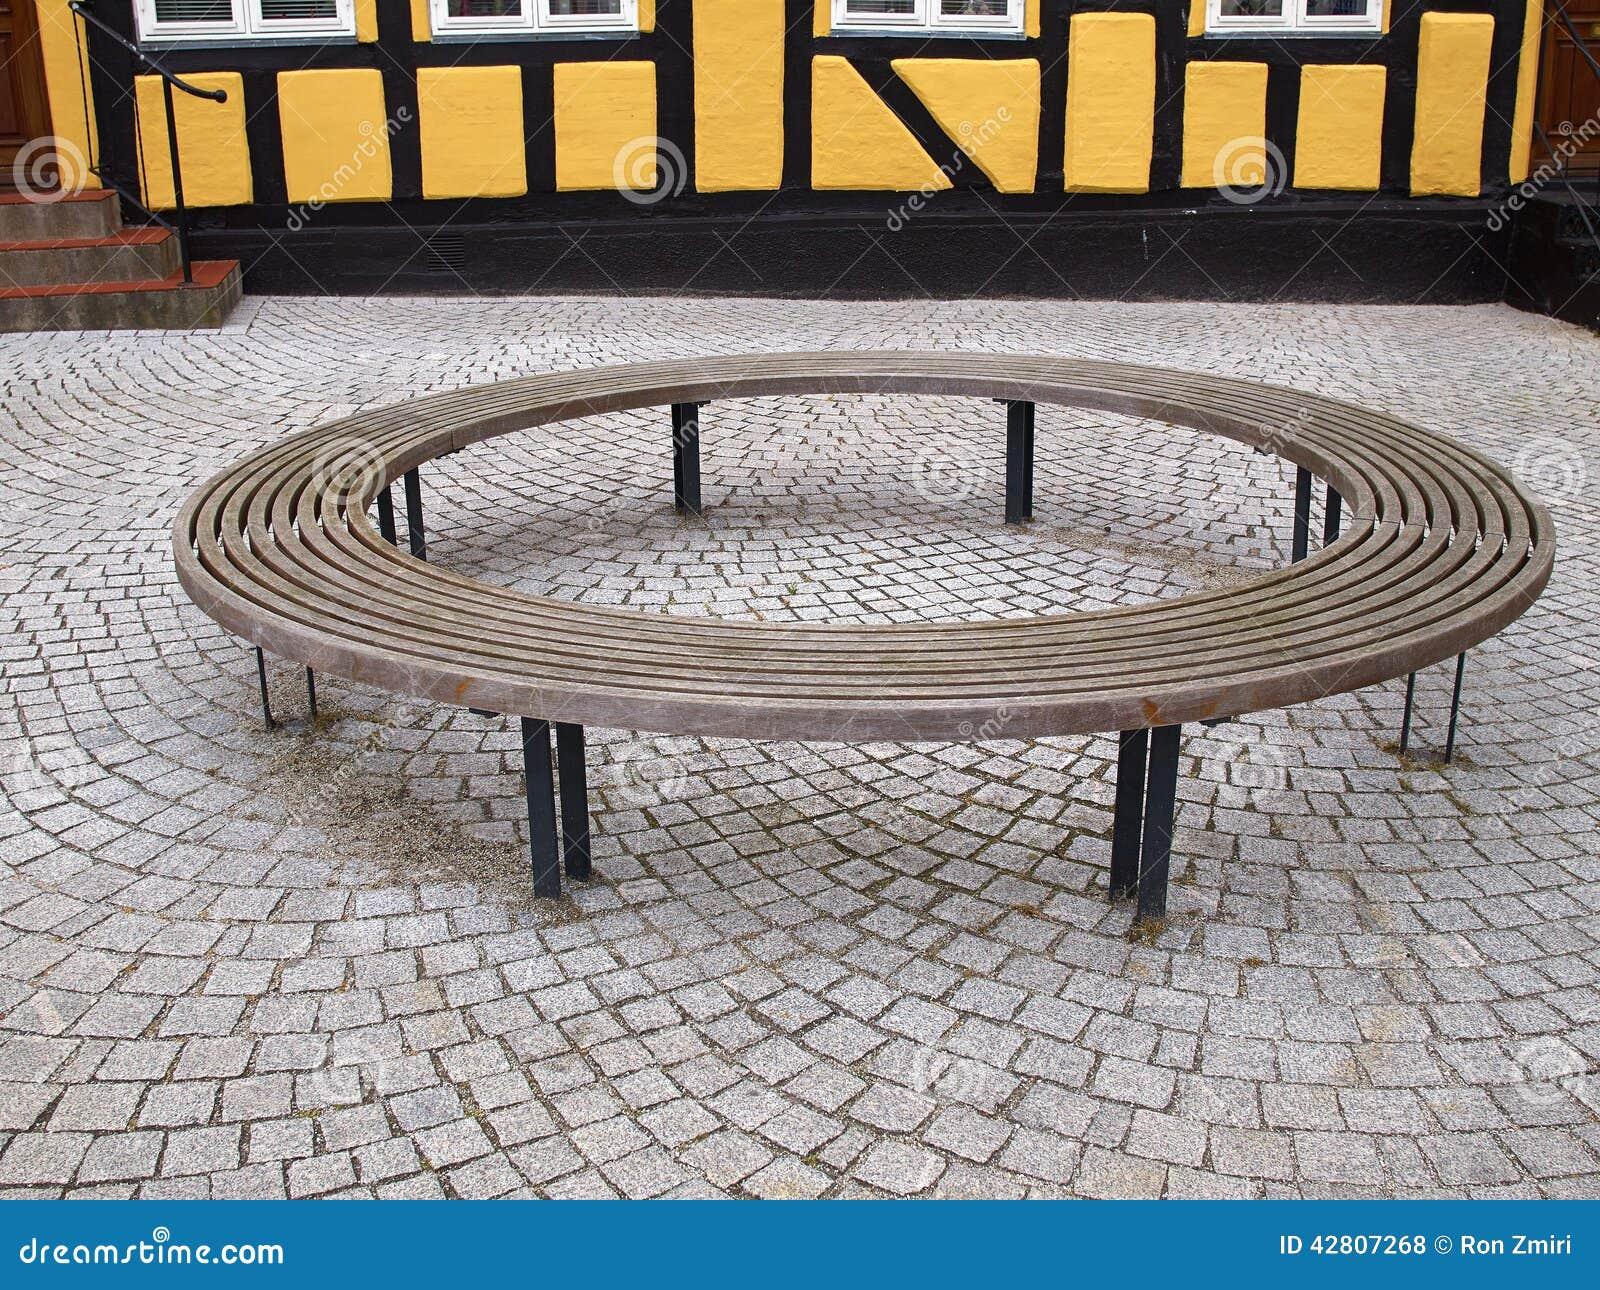 banc circulaire rond en bois photo stock image 42807268. Black Bedroom Furniture Sets. Home Design Ideas